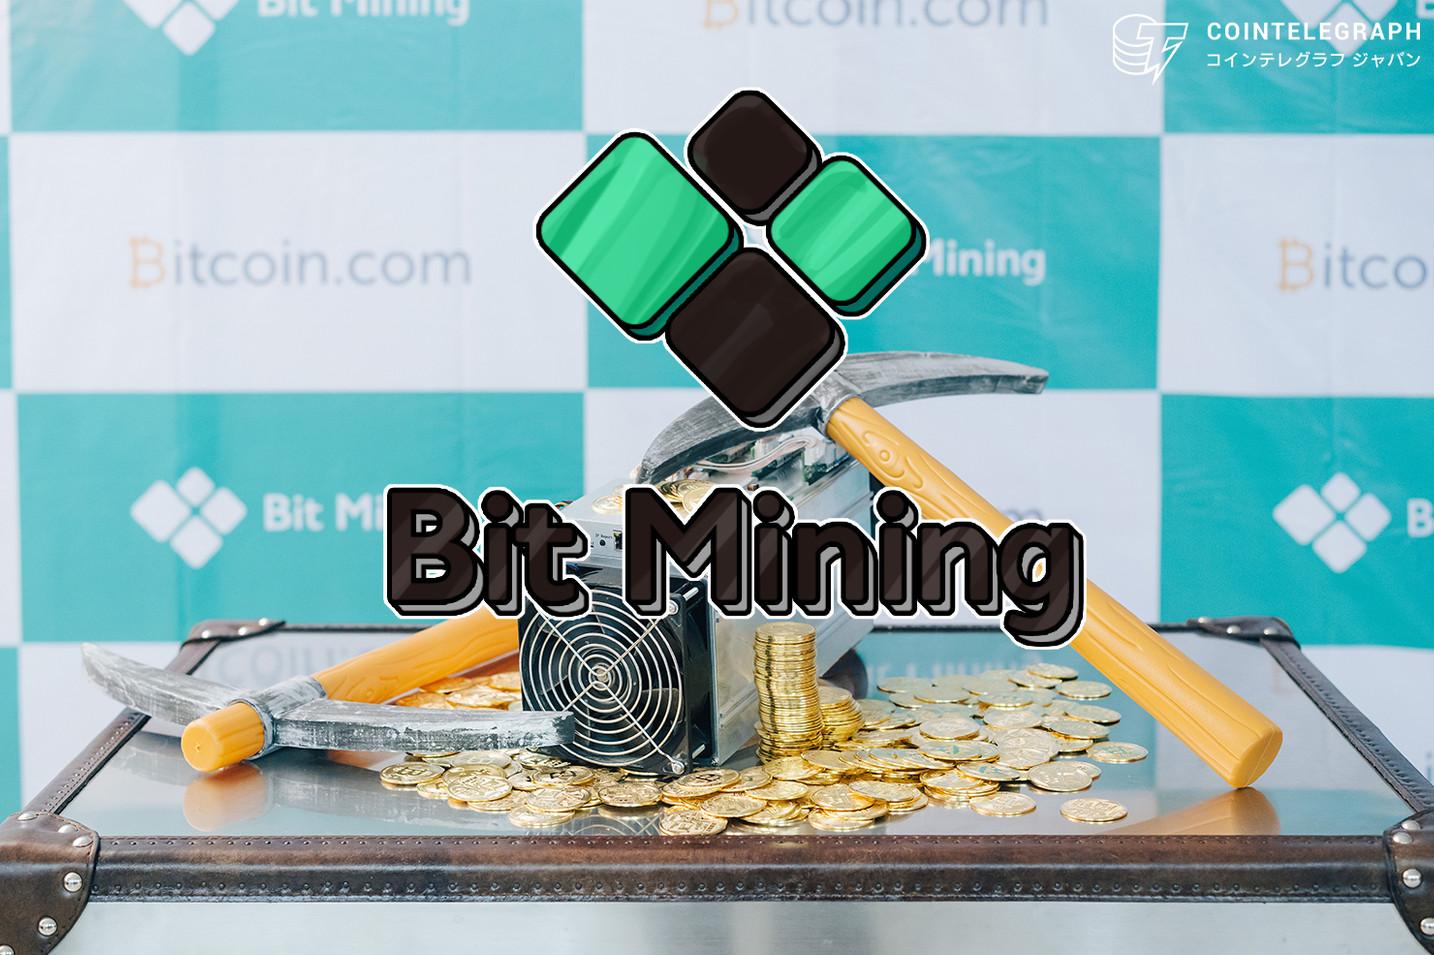 Bitcoin.comとBit Miningの業務提携に関するお知らせ